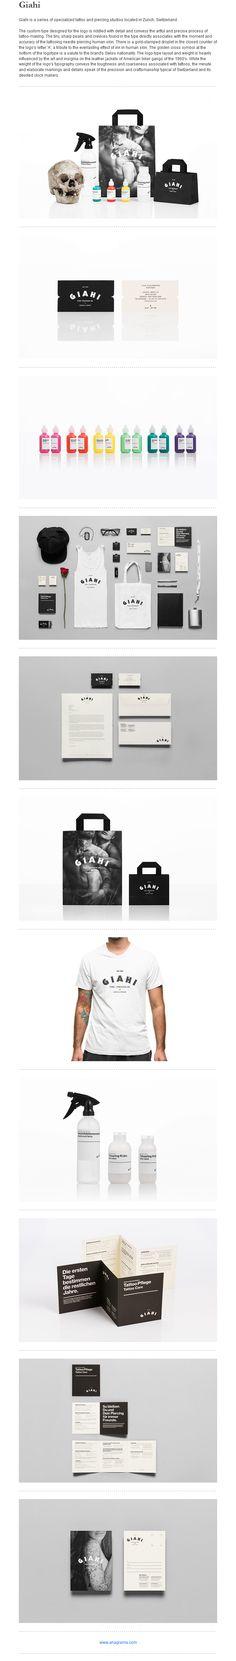 Giahi // Tattoo Switzerland | #stationary #corporate #design #corporatedesign #logo #identity #branding #marketing <<< repinned by an #advertising agency from #Hamburg / #Germany - www.BlickeDeeler.de | Follow us on www.facebook.com/BlickeDeeler